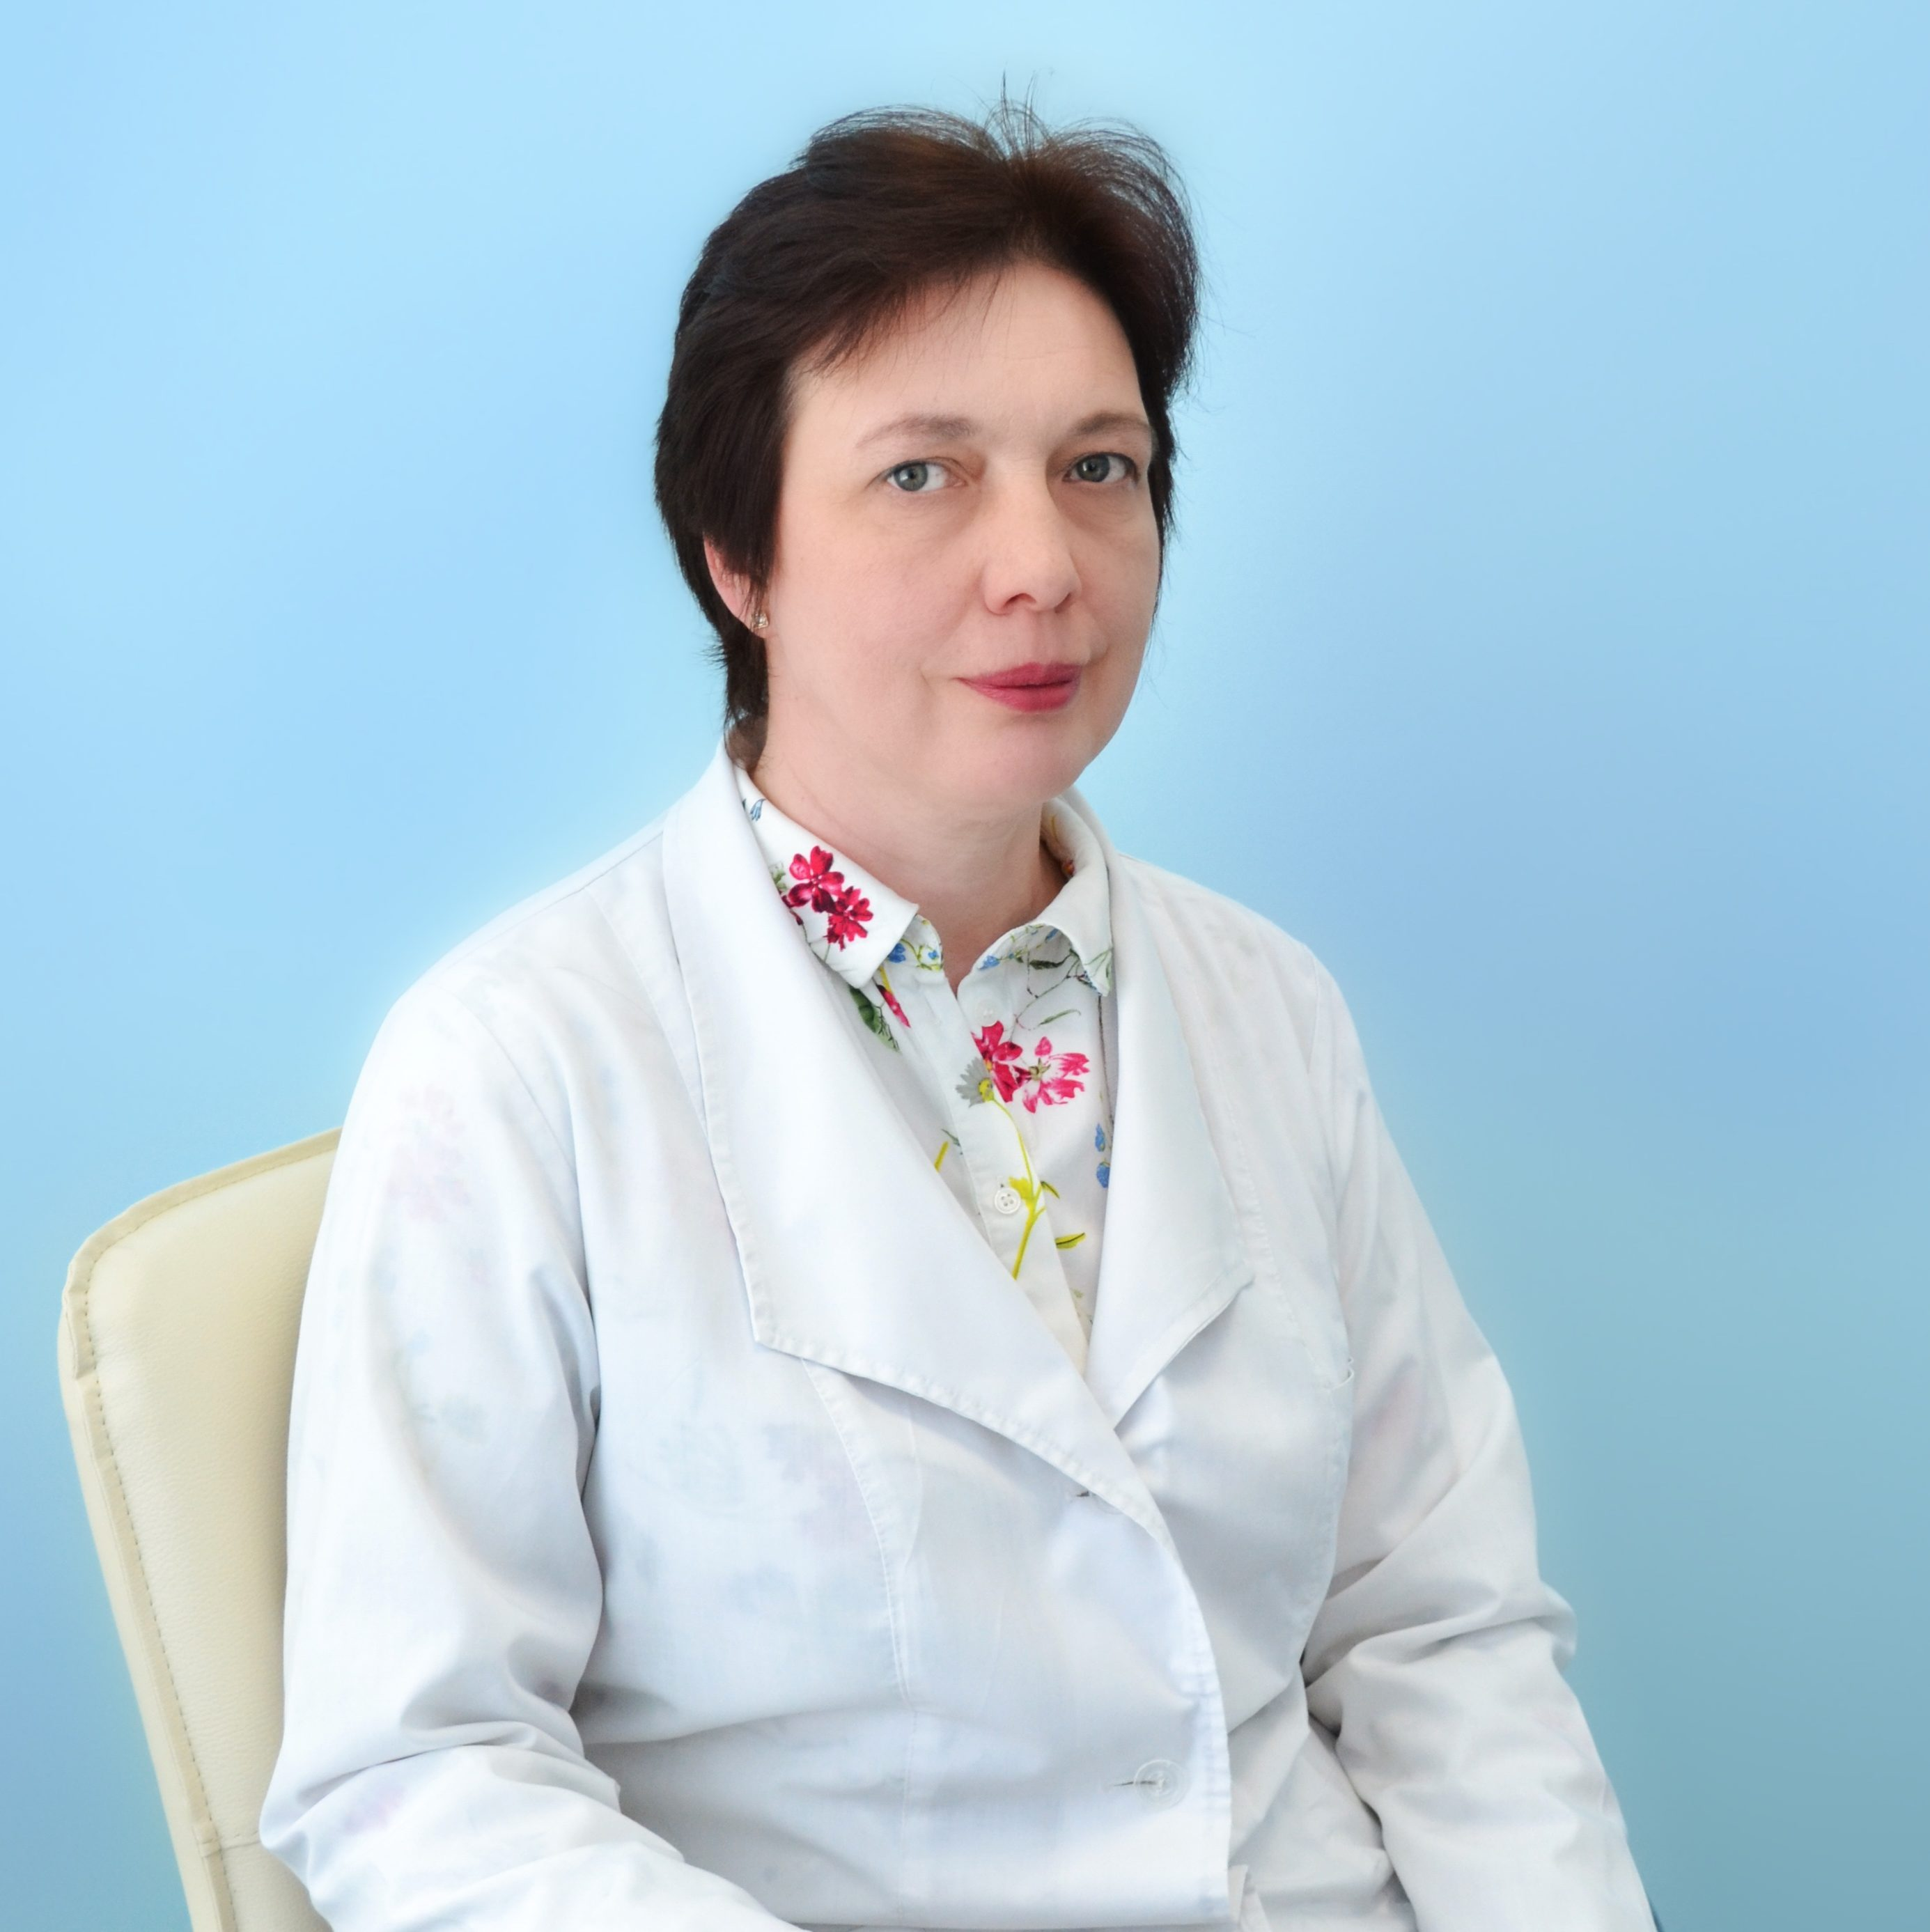 Сафонова Светлана Владимировна, врач-терапевт